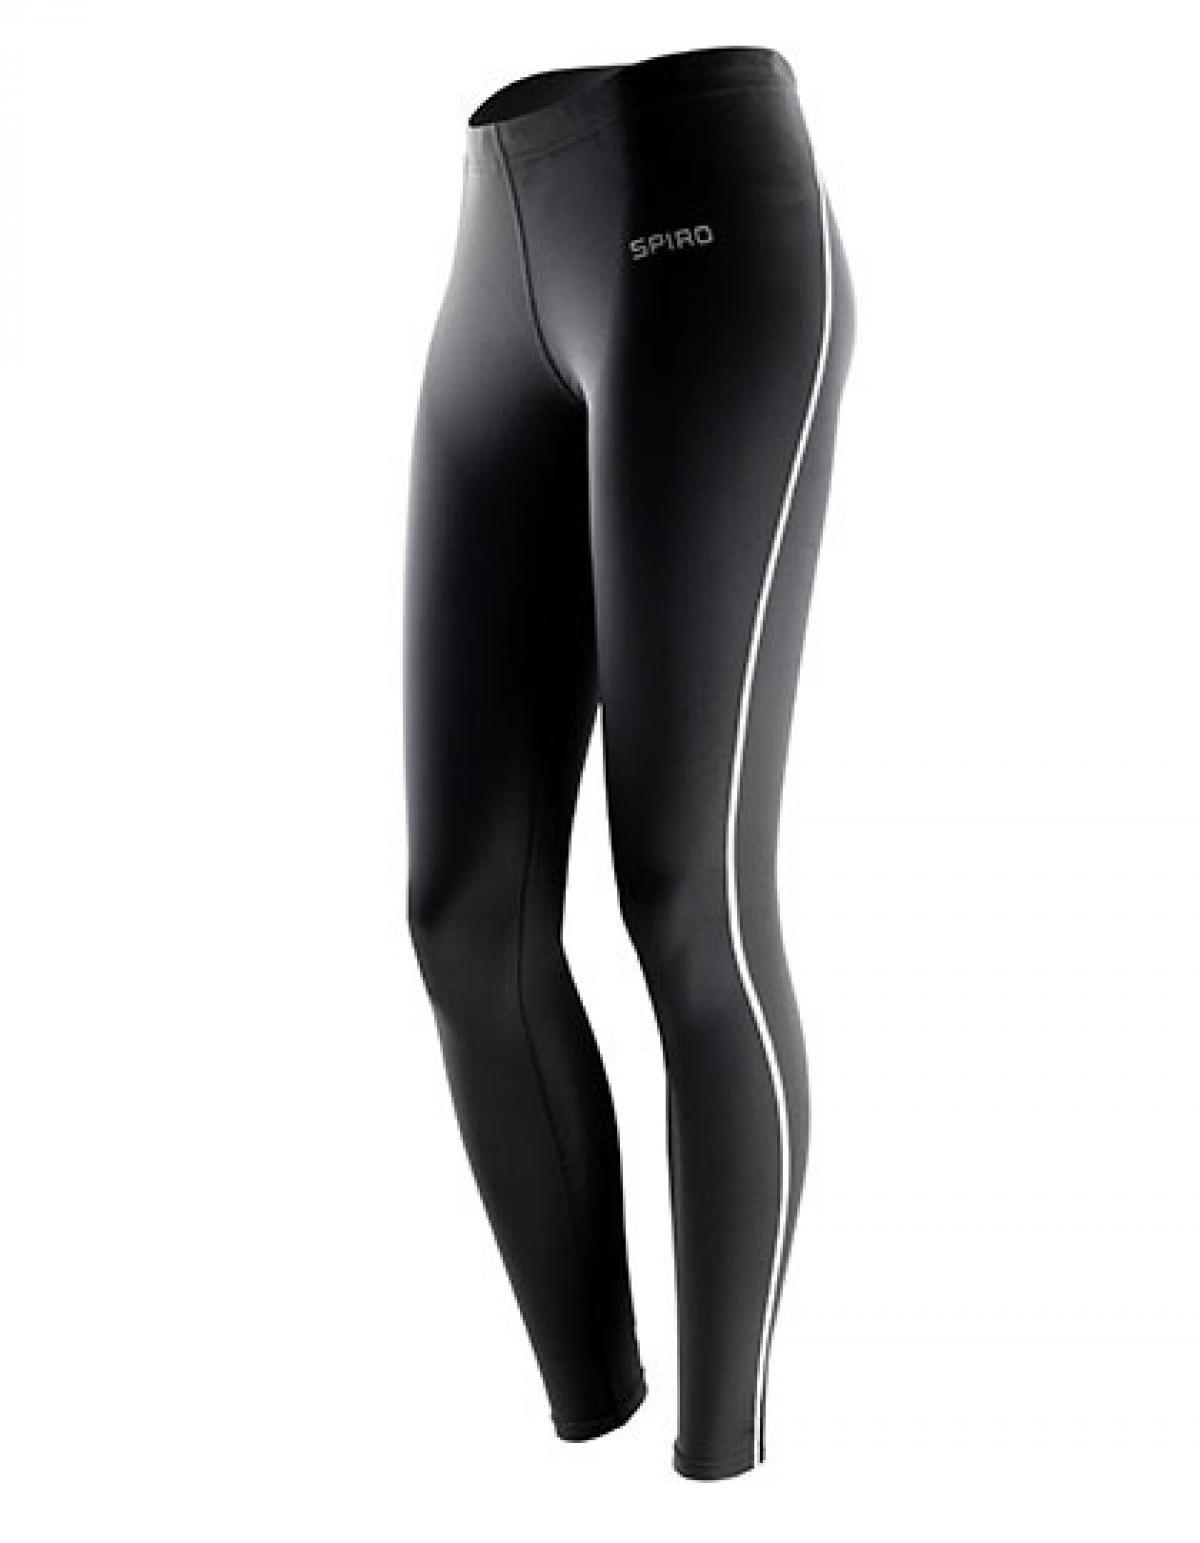 damen bodyfit sport leggings atmungsaktiv rexlander s. Black Bedroom Furniture Sets. Home Design Ideas